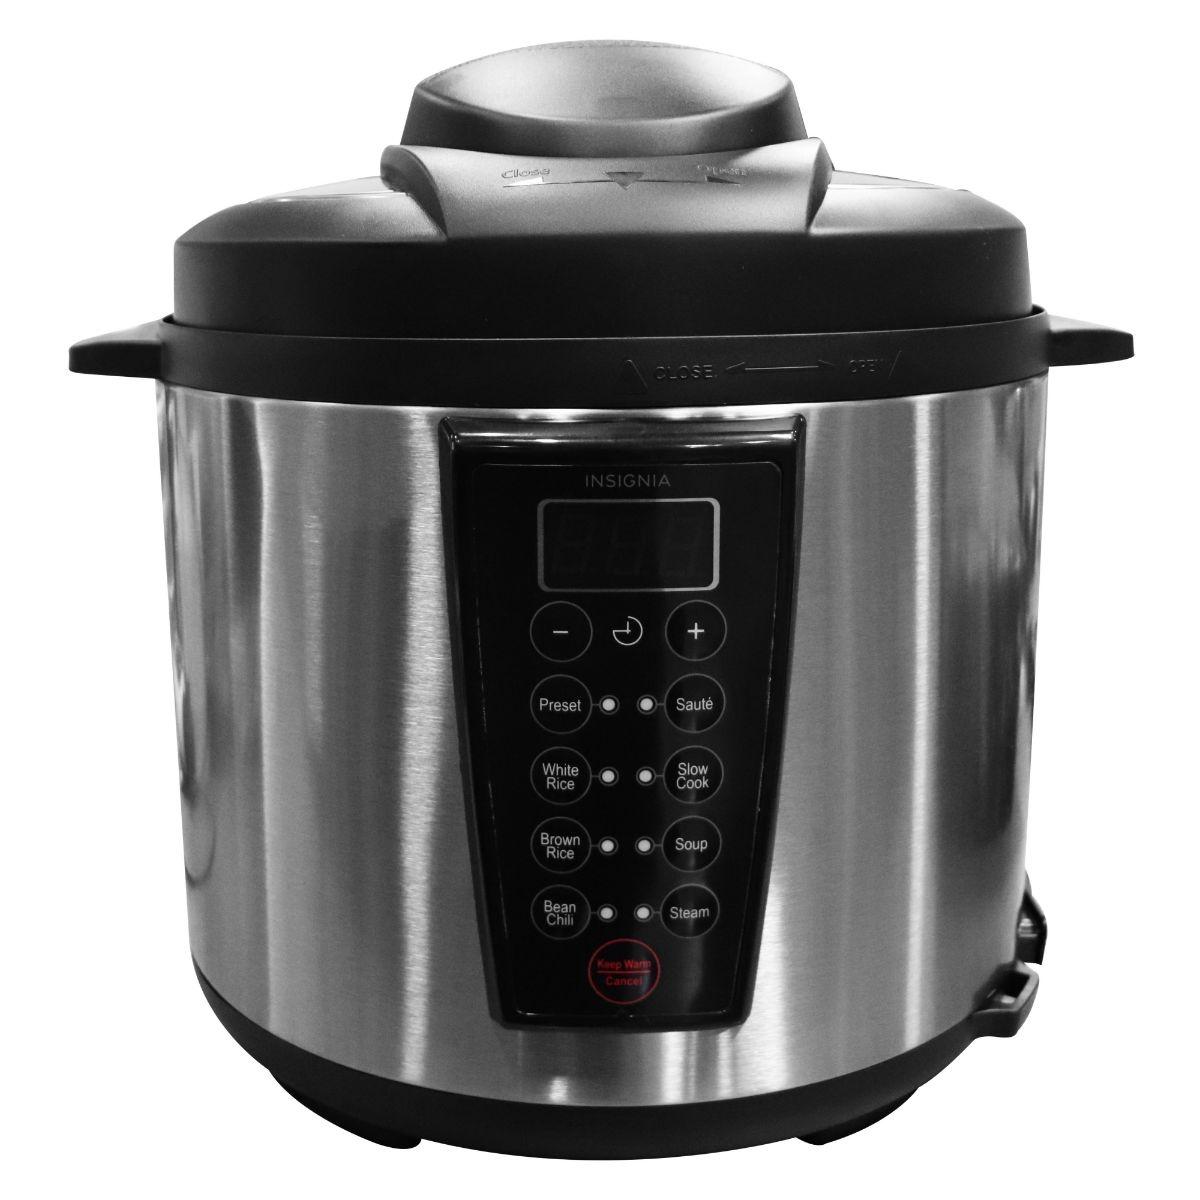 Insignia - 6-Quart Pressure Cooker - Stainless Steel/Black